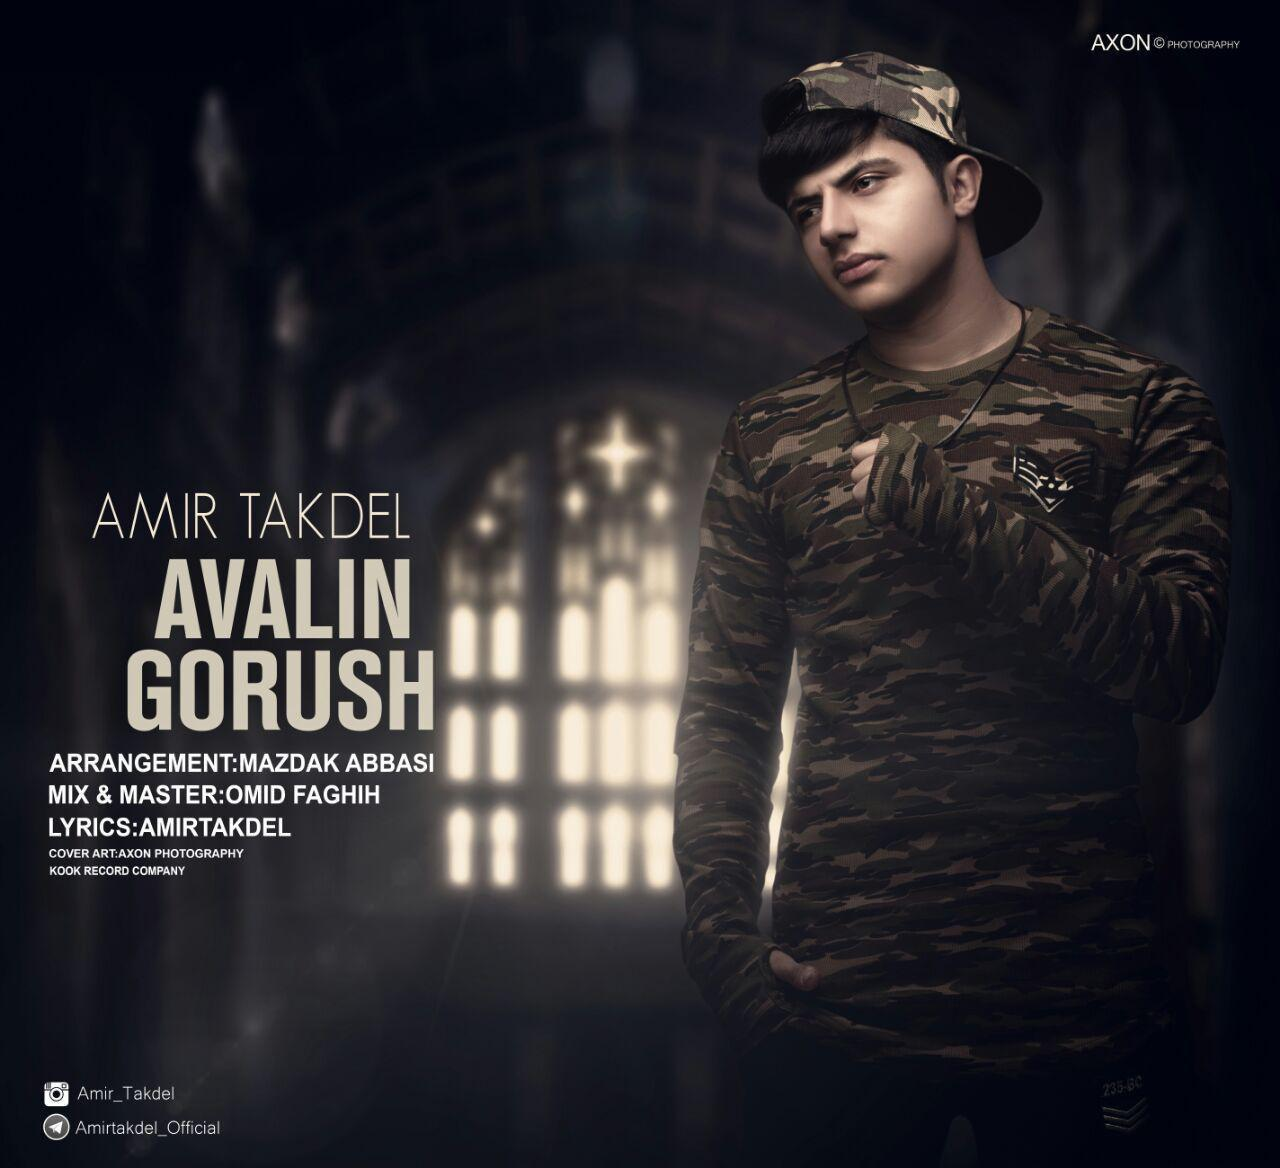 http://s9.picofile.com/file/8301219234/014Amir_Takdel_Avalin_Gorush.jpg